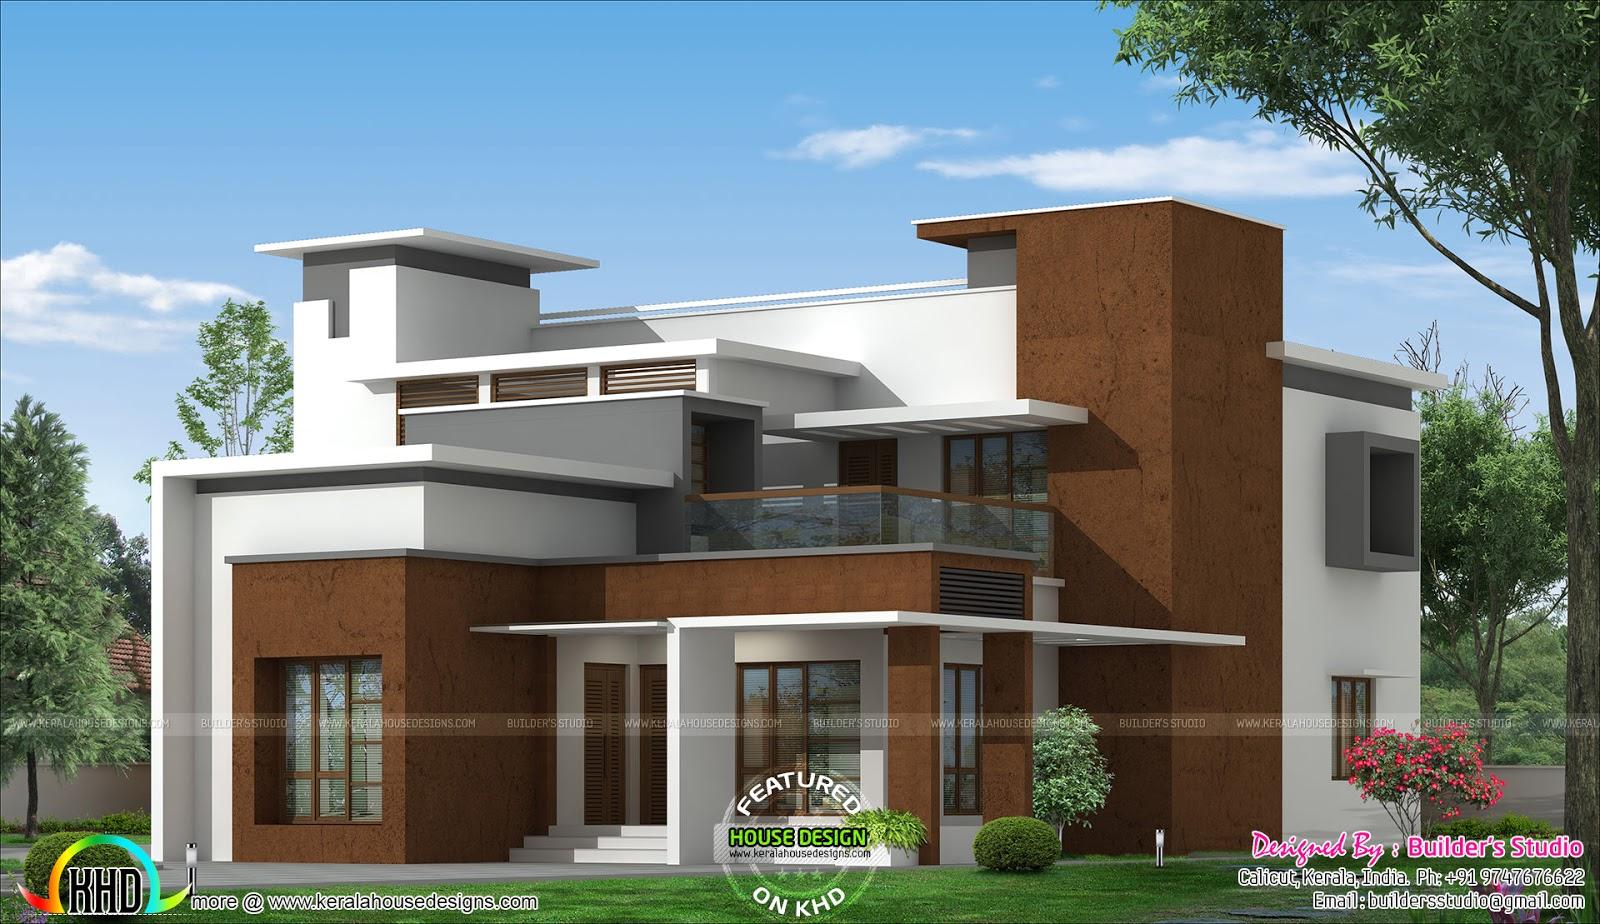 Box type modern home architecture plan - Kerala home ...